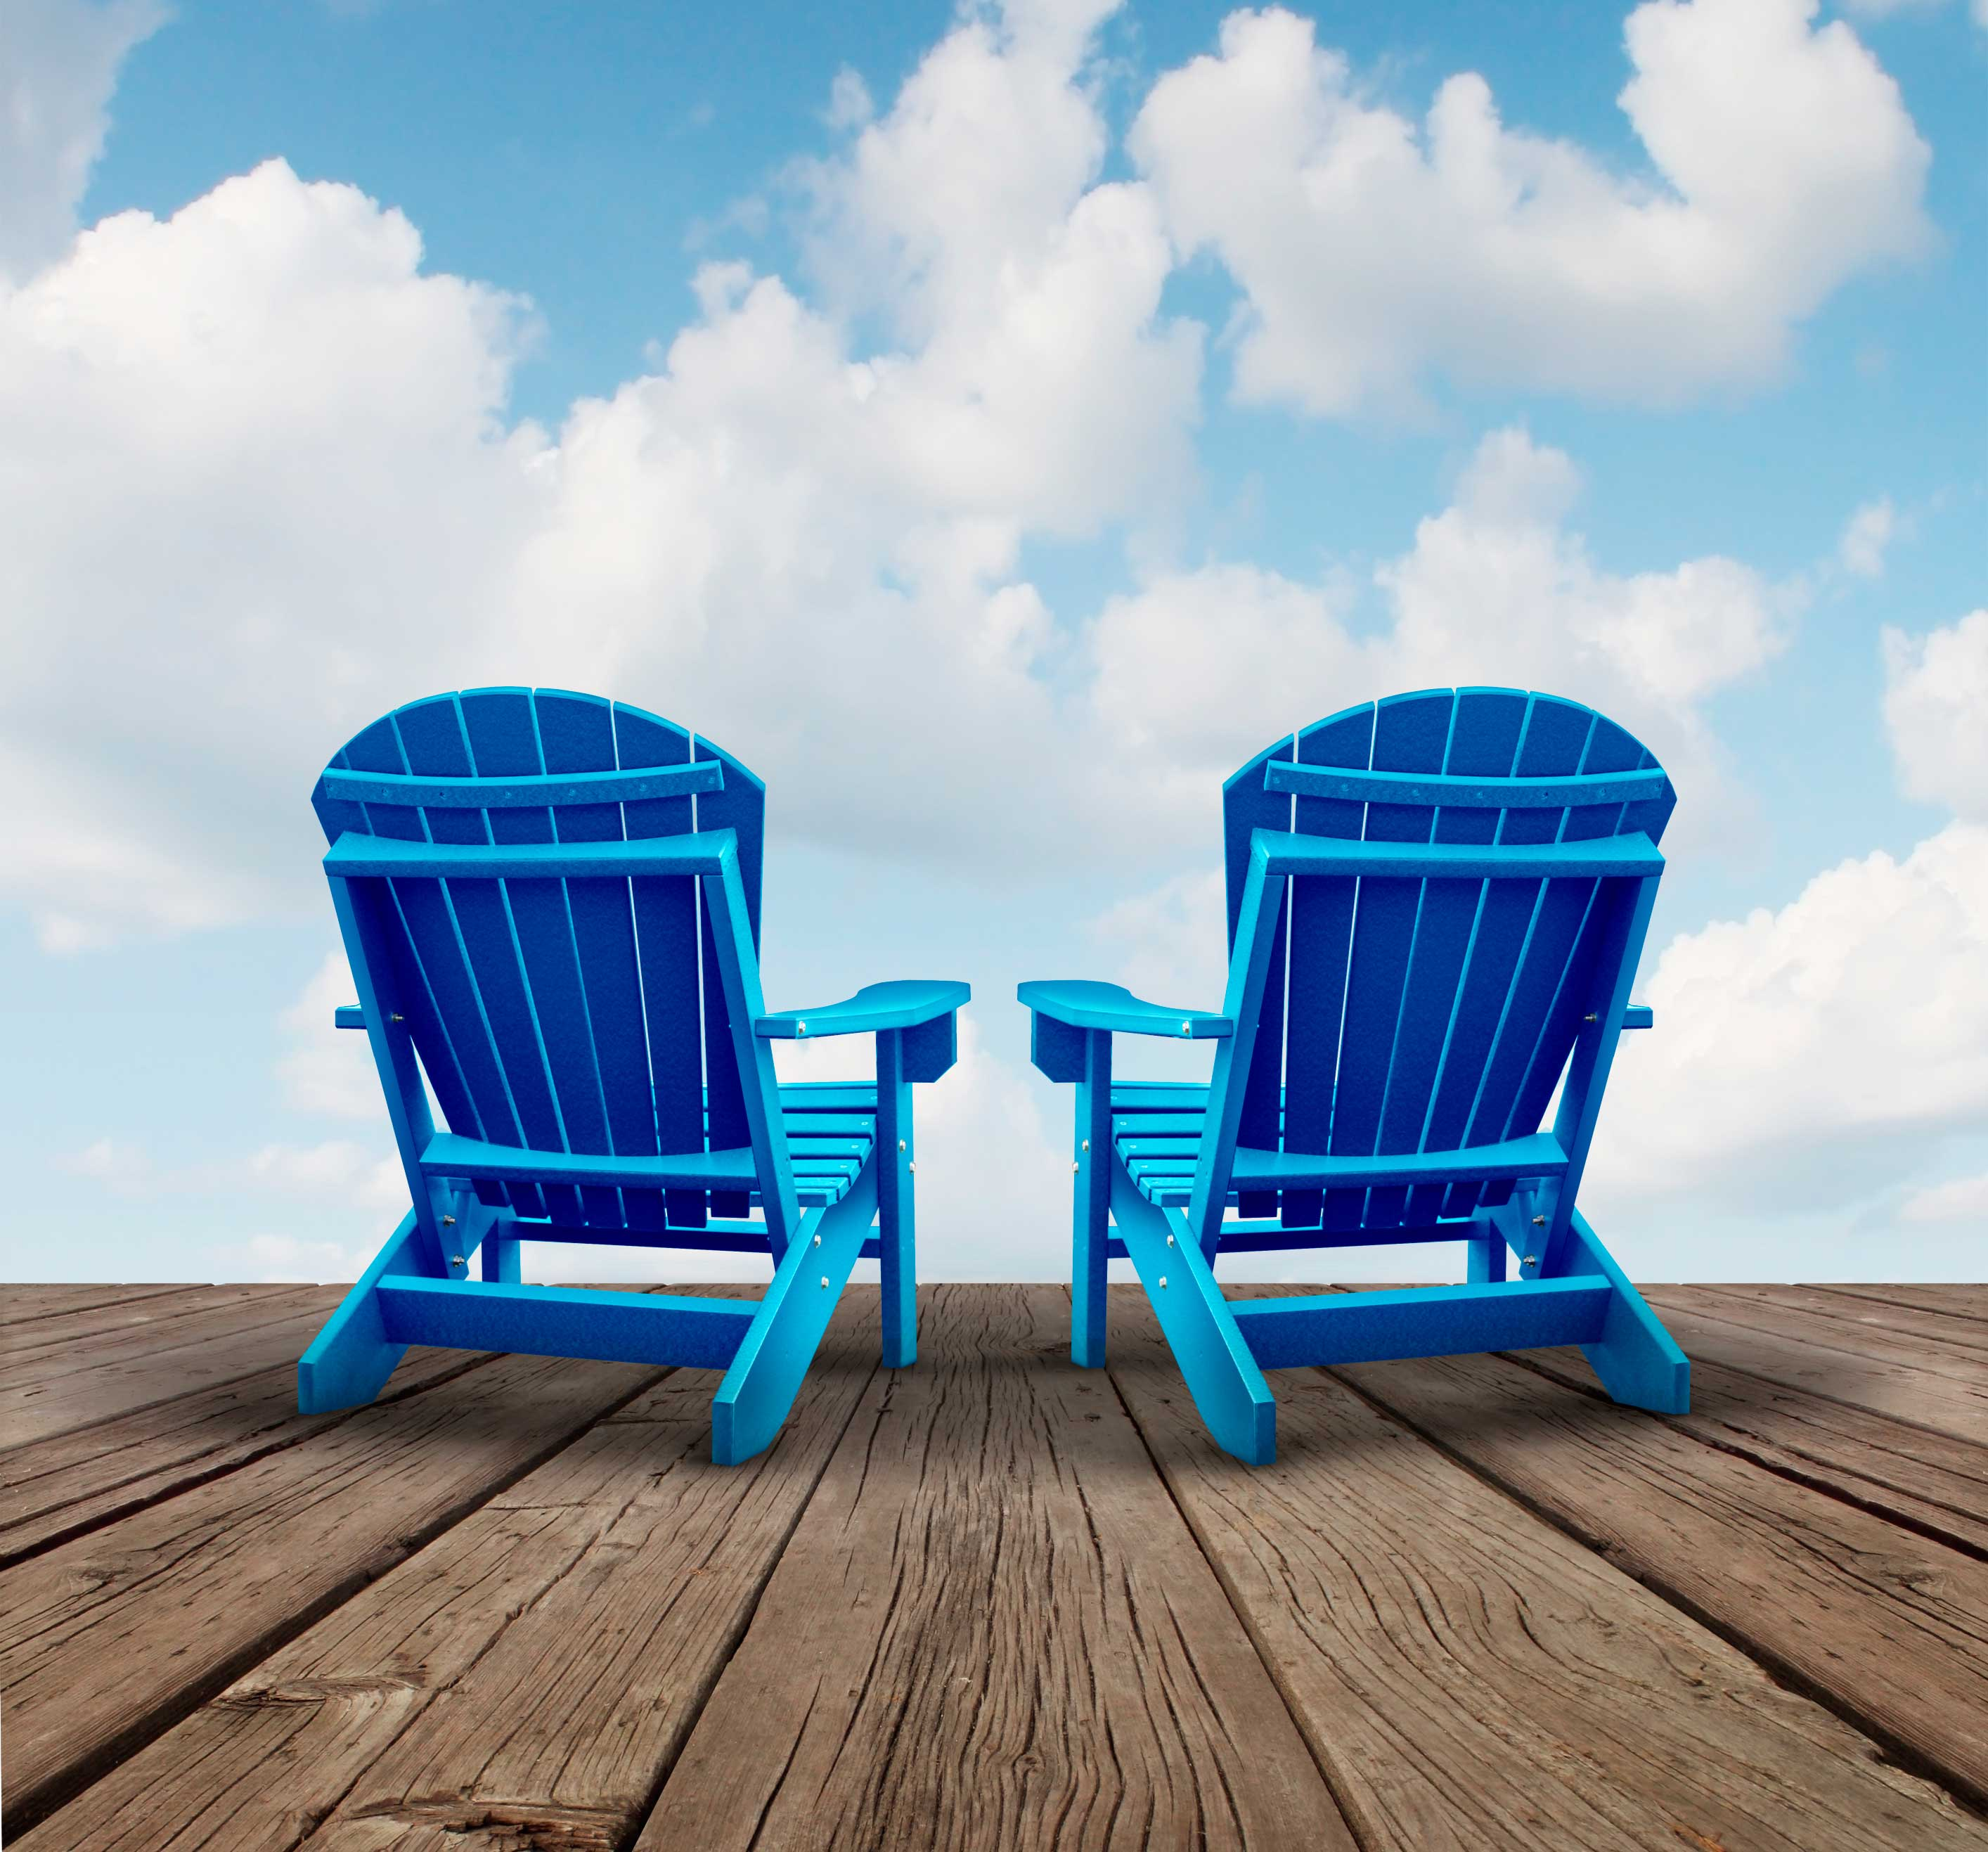 Photo courtesy Shutterstock